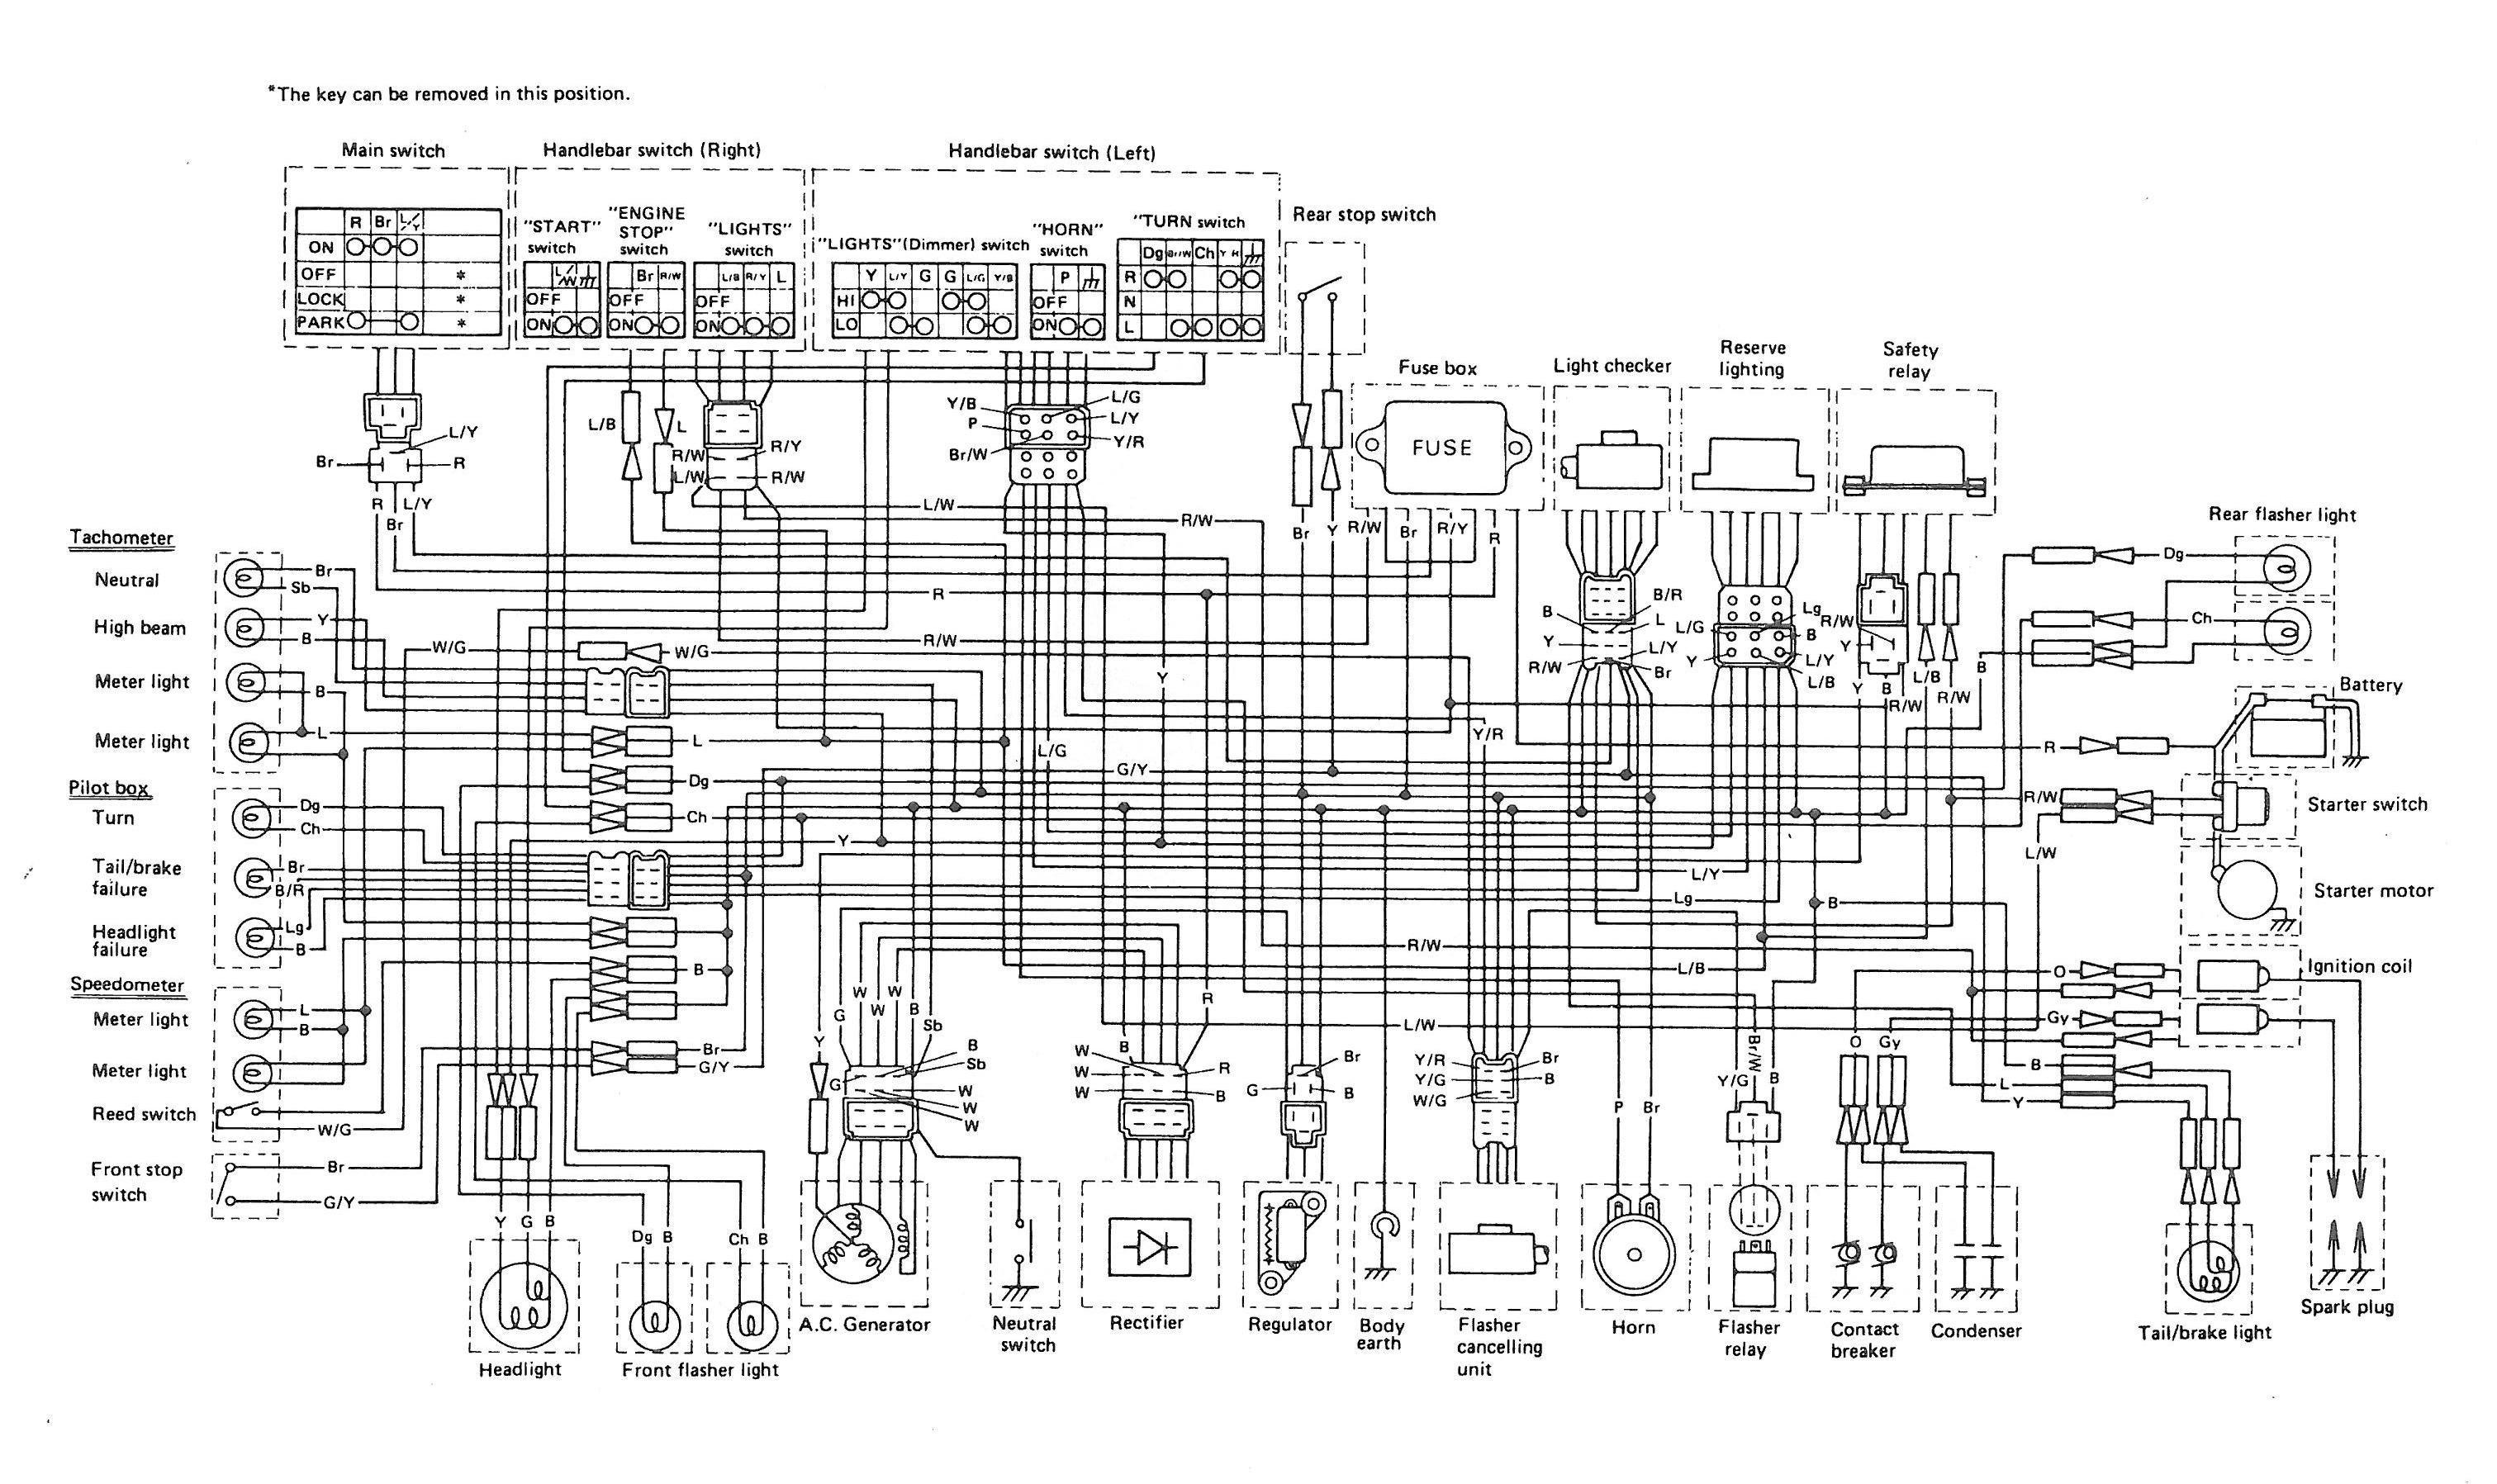 1980 Yamaha Xs1100 Wiring Diagram 1980 Yamaha Xs1100 Wiring Diagram Mikulskilawoffices Of 1980 Yamaha Xs1100 Wiring Diagram